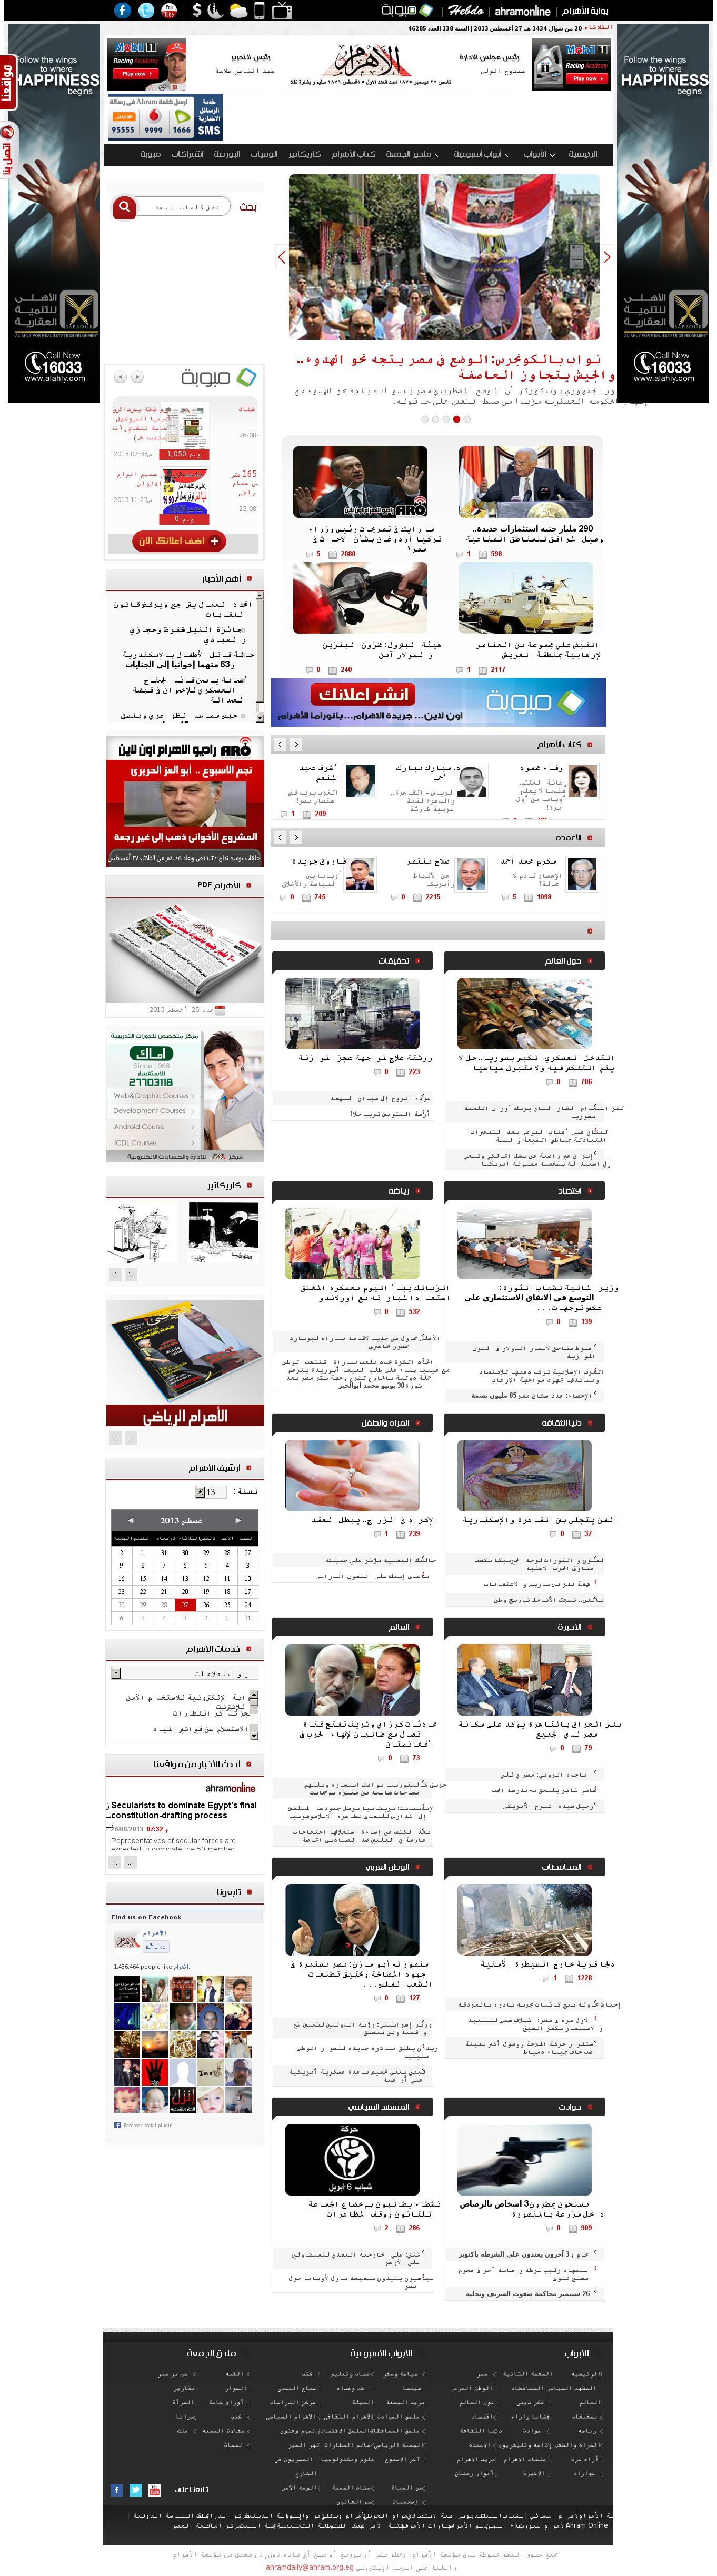 Al-Ahram at Tuesday Aug. 27, 2013, 6 a.m. UTC